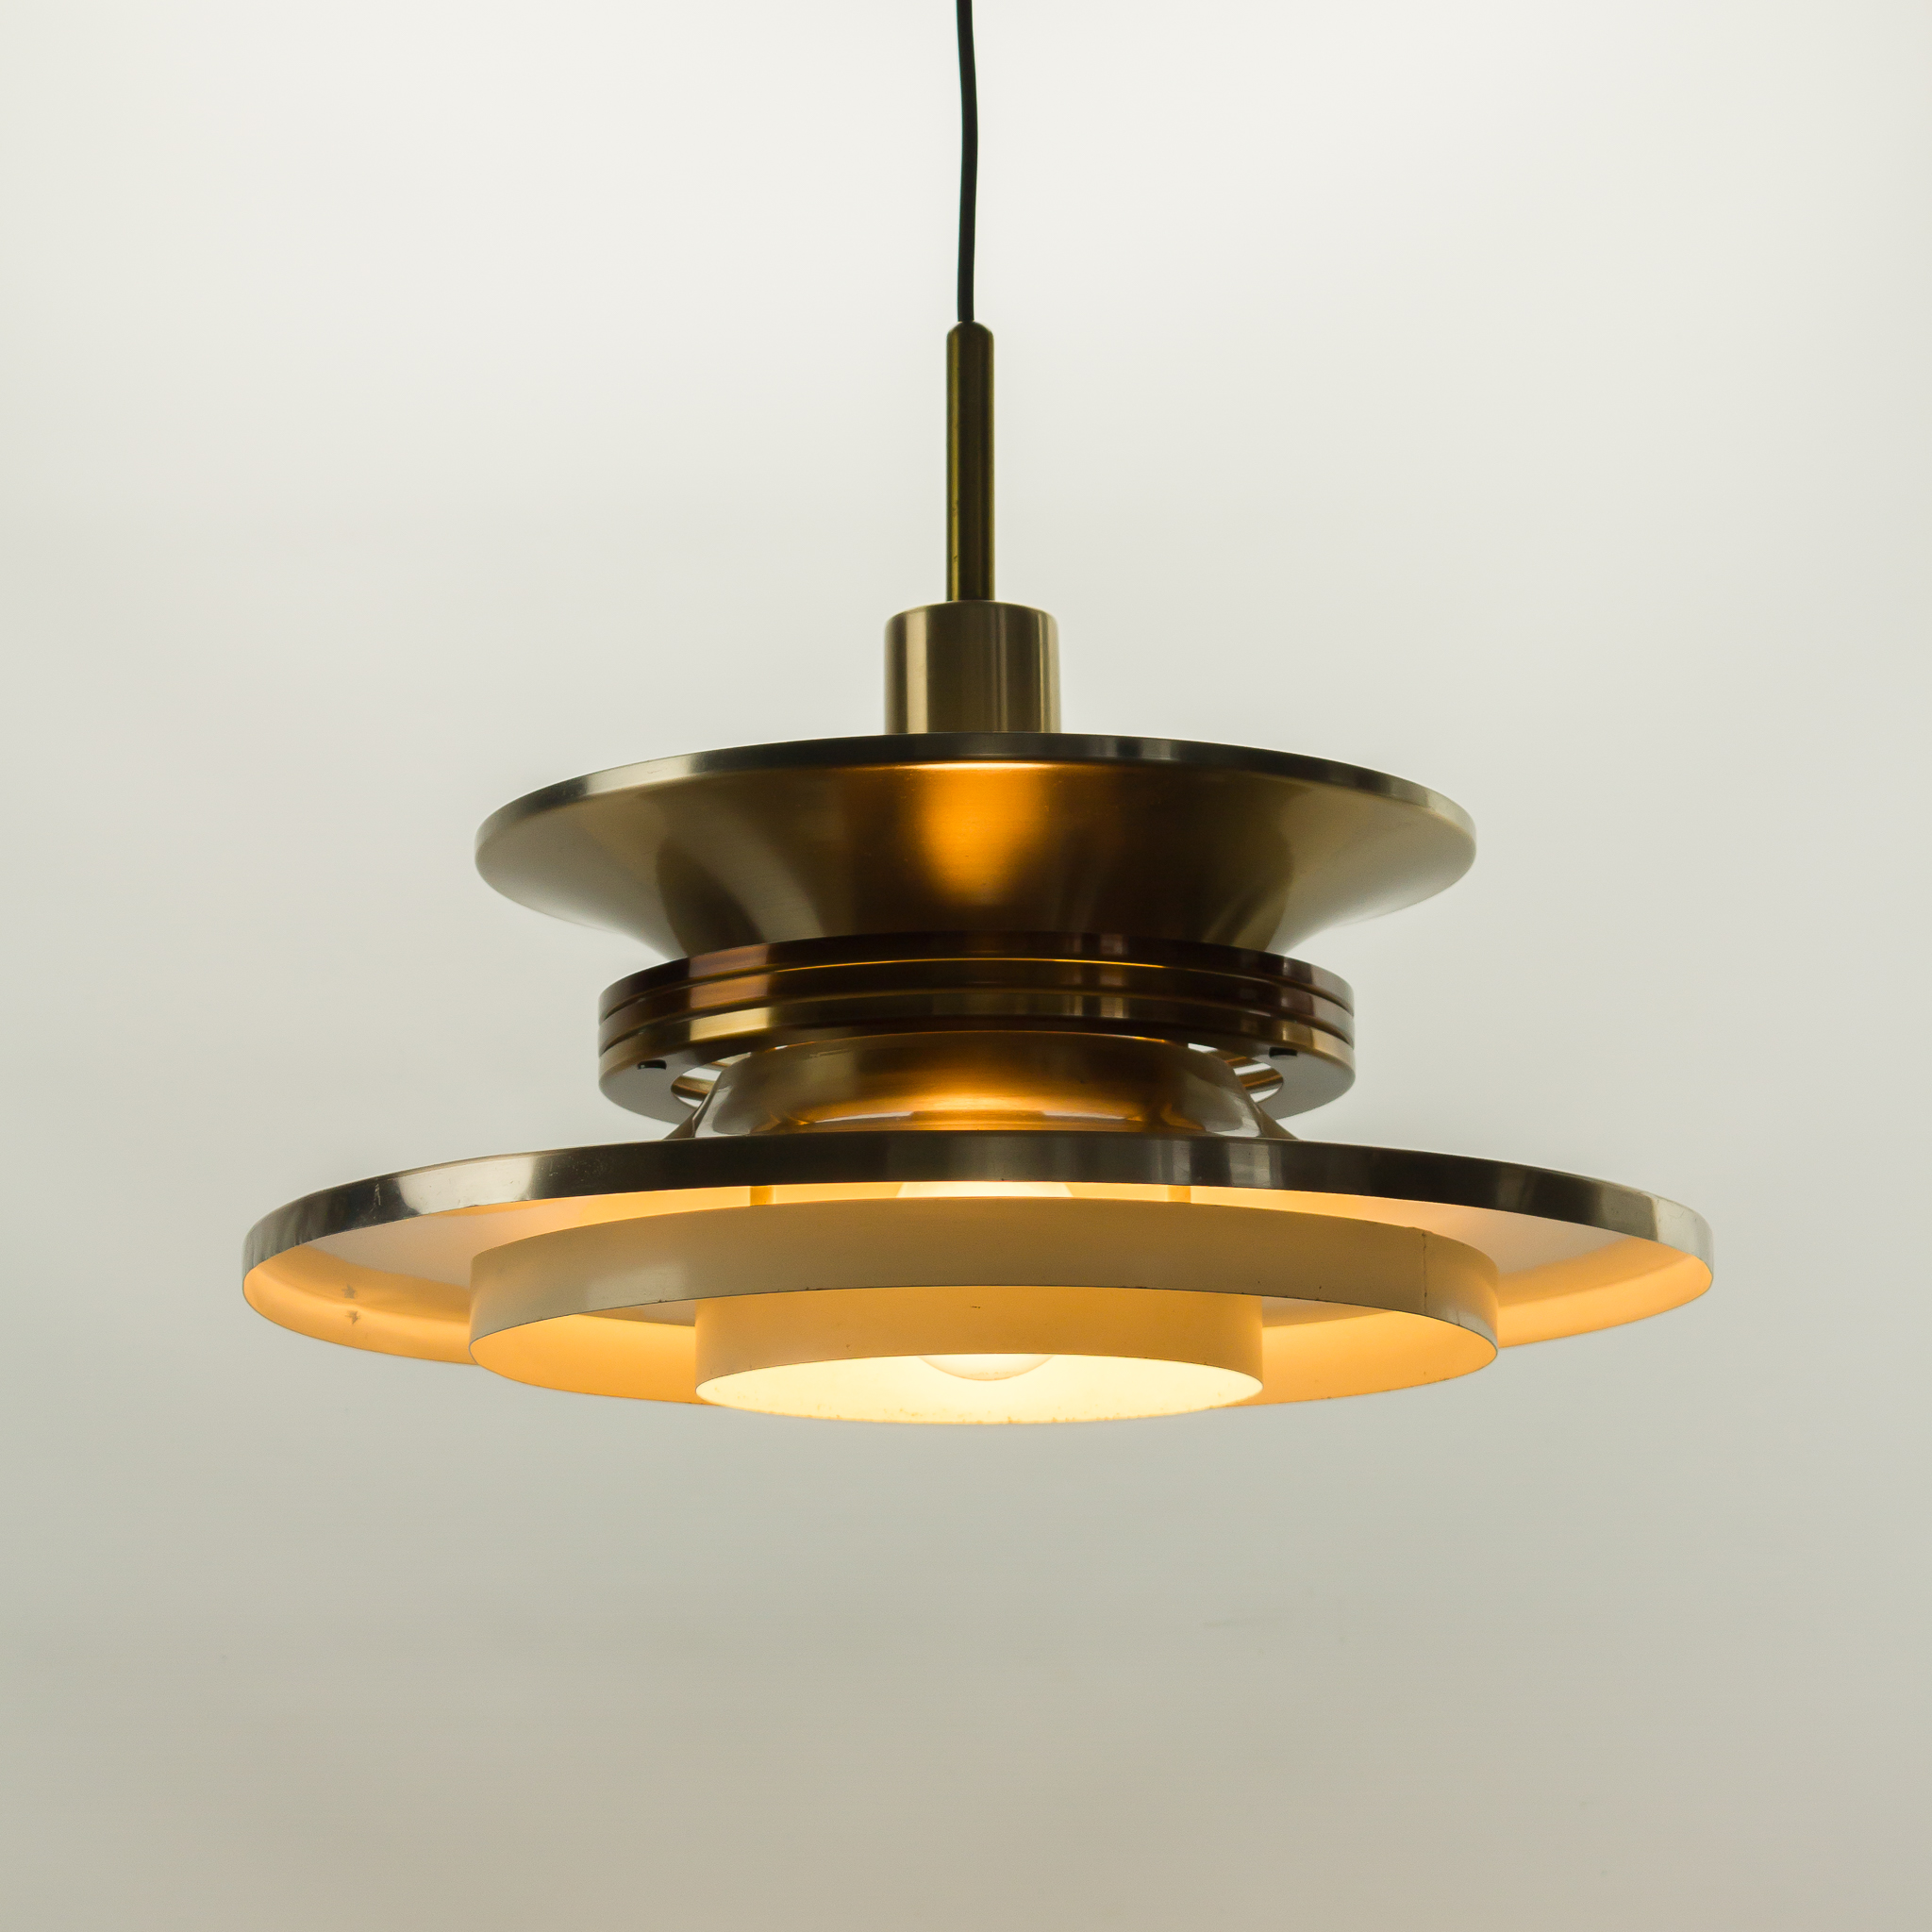 60 70 s louis poulsen stijl design hanglamp uniek barbmama